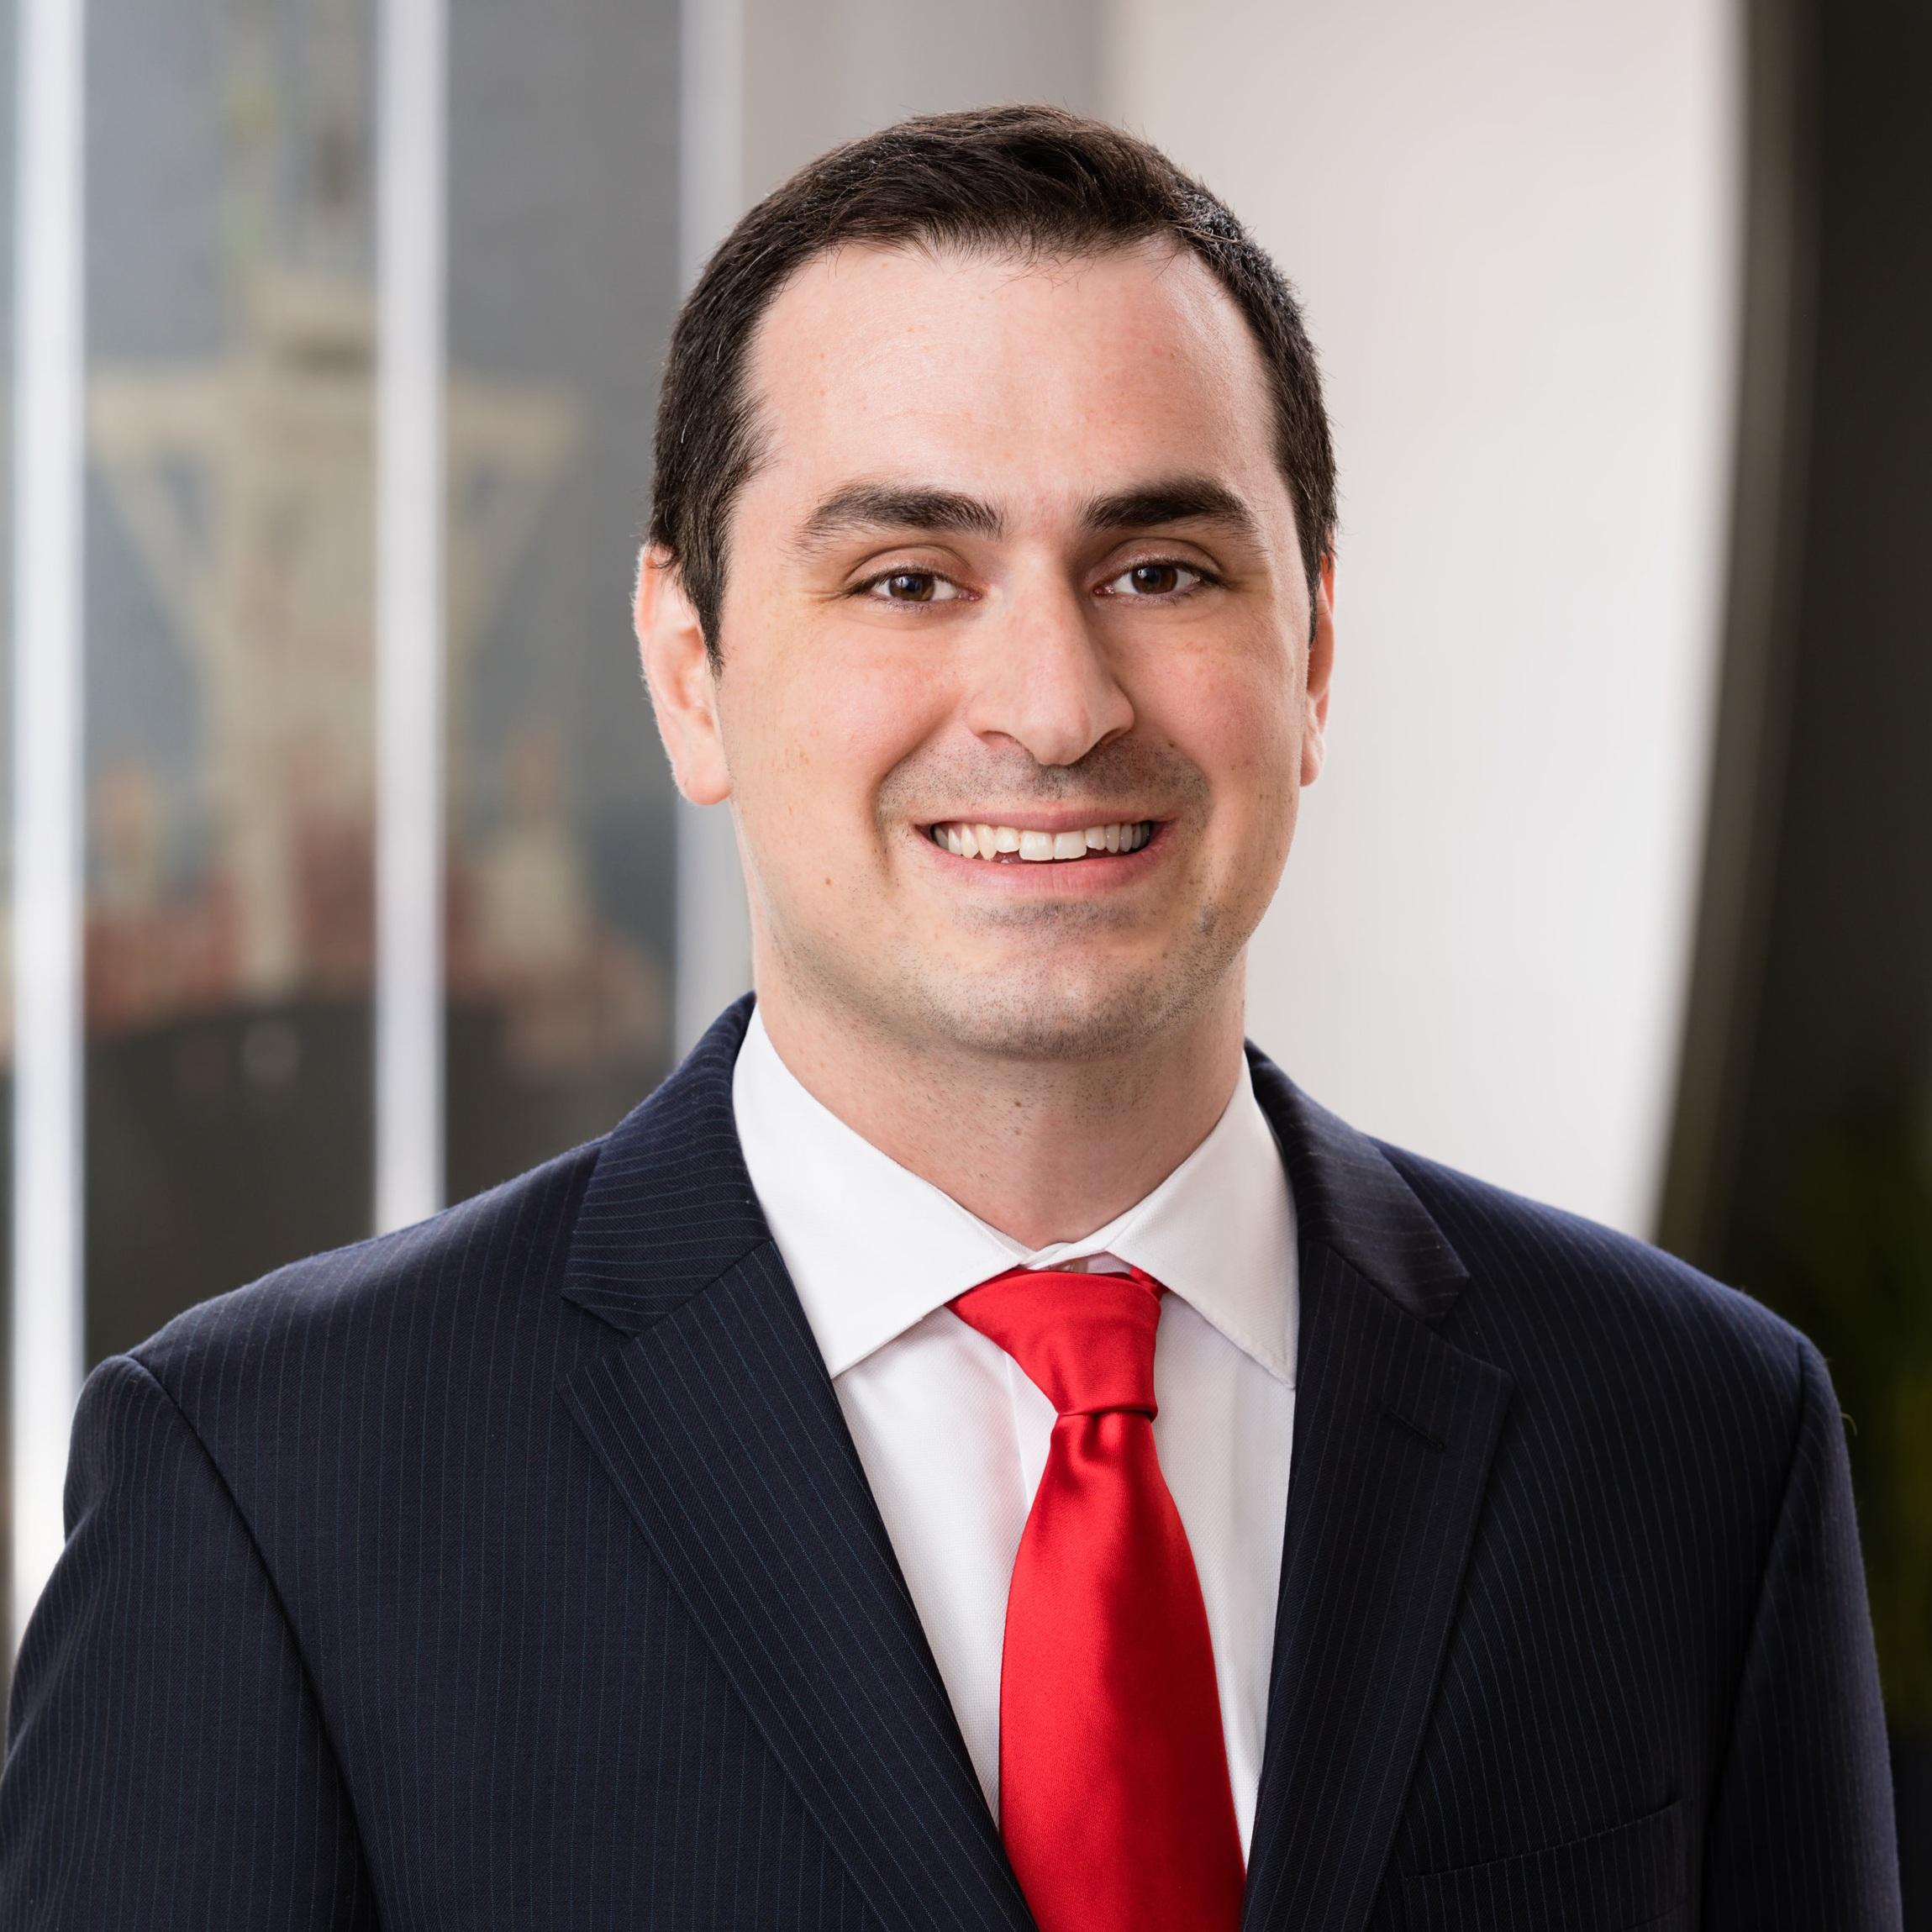 Coby Haim, CPA - Tax Supervisor212-605-3172chaim@pwcpa.comDOWNLOAD V-CARD ⬇